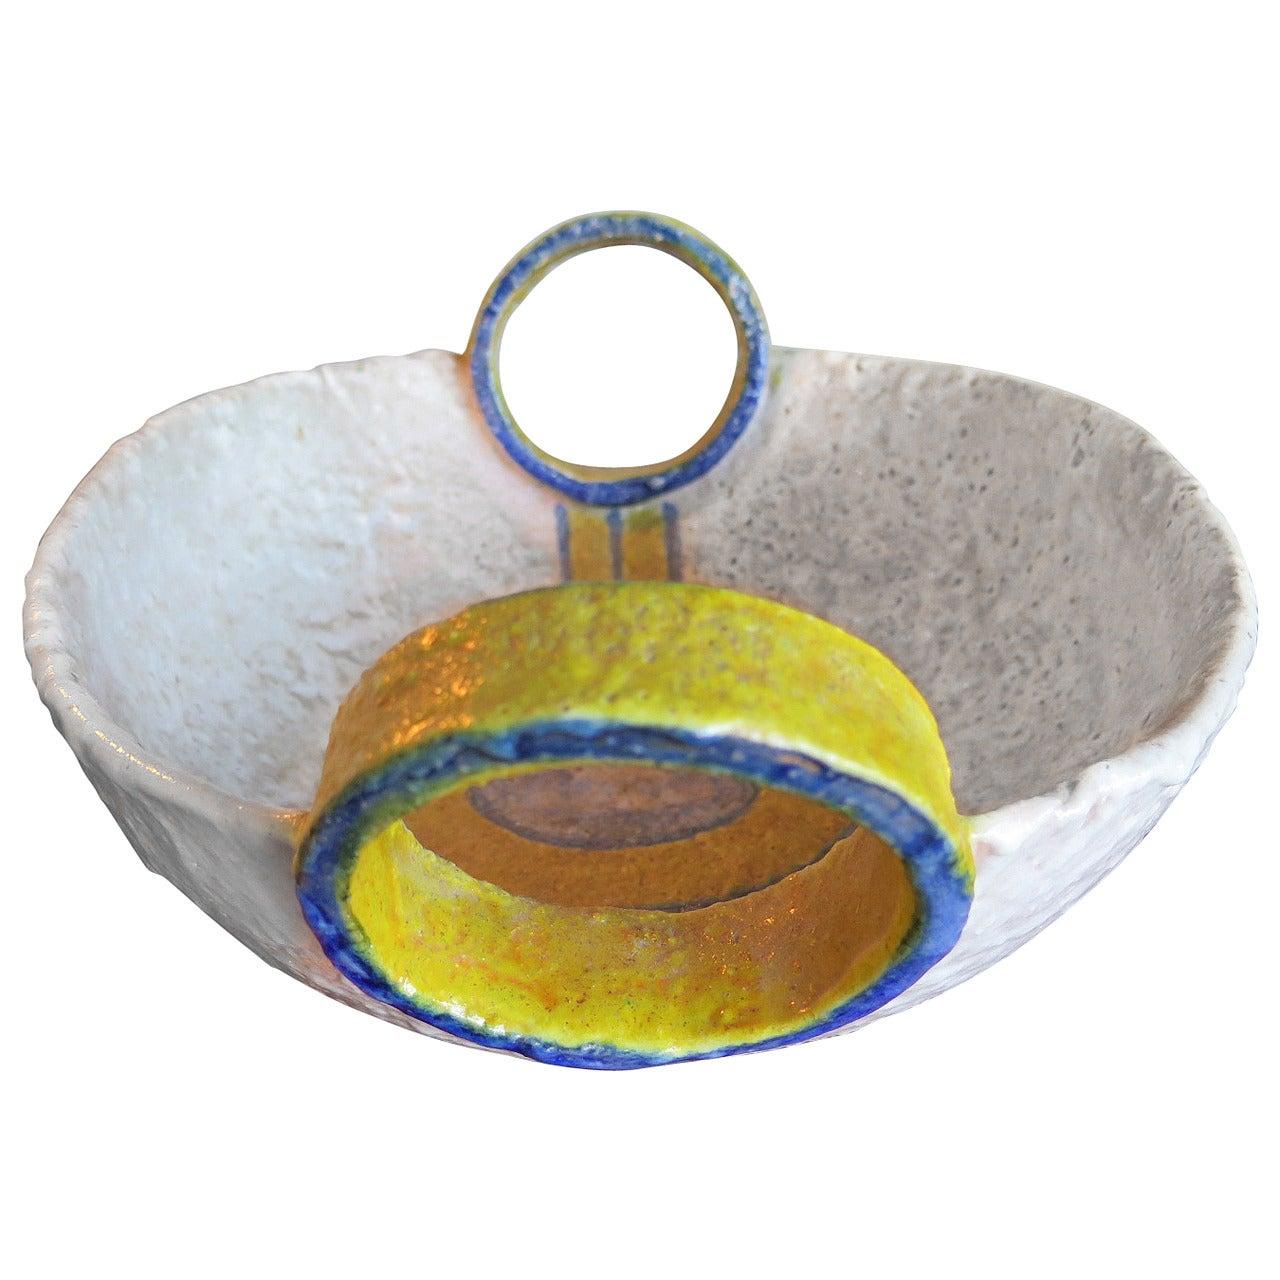 Unusual Ceramic Vessel by Raymor, Italy